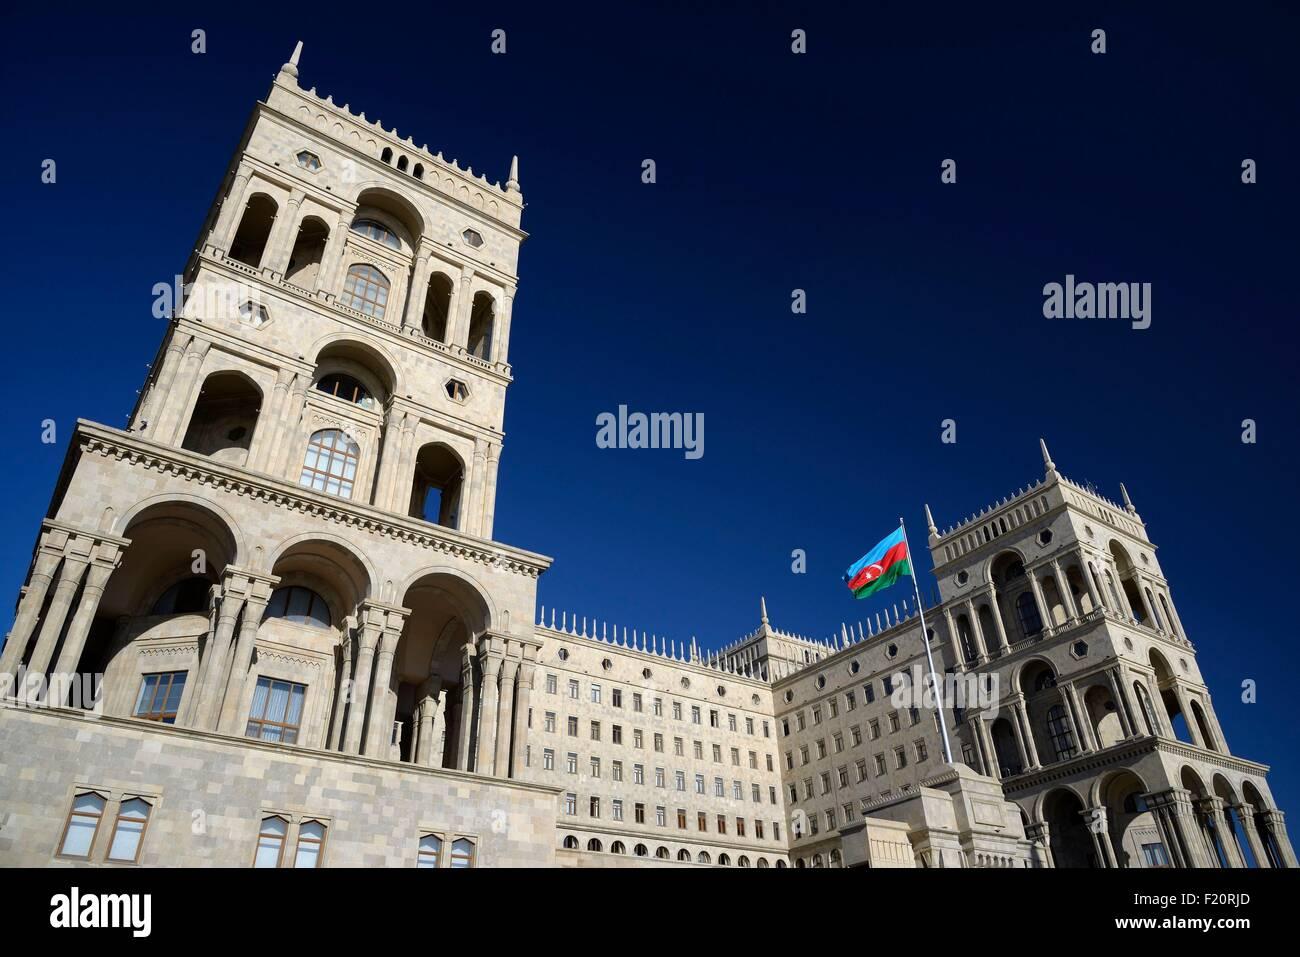 Azerbaijan, Baku, avenue Neftτiler Prospekt, Government House with the national flag - Stock Image